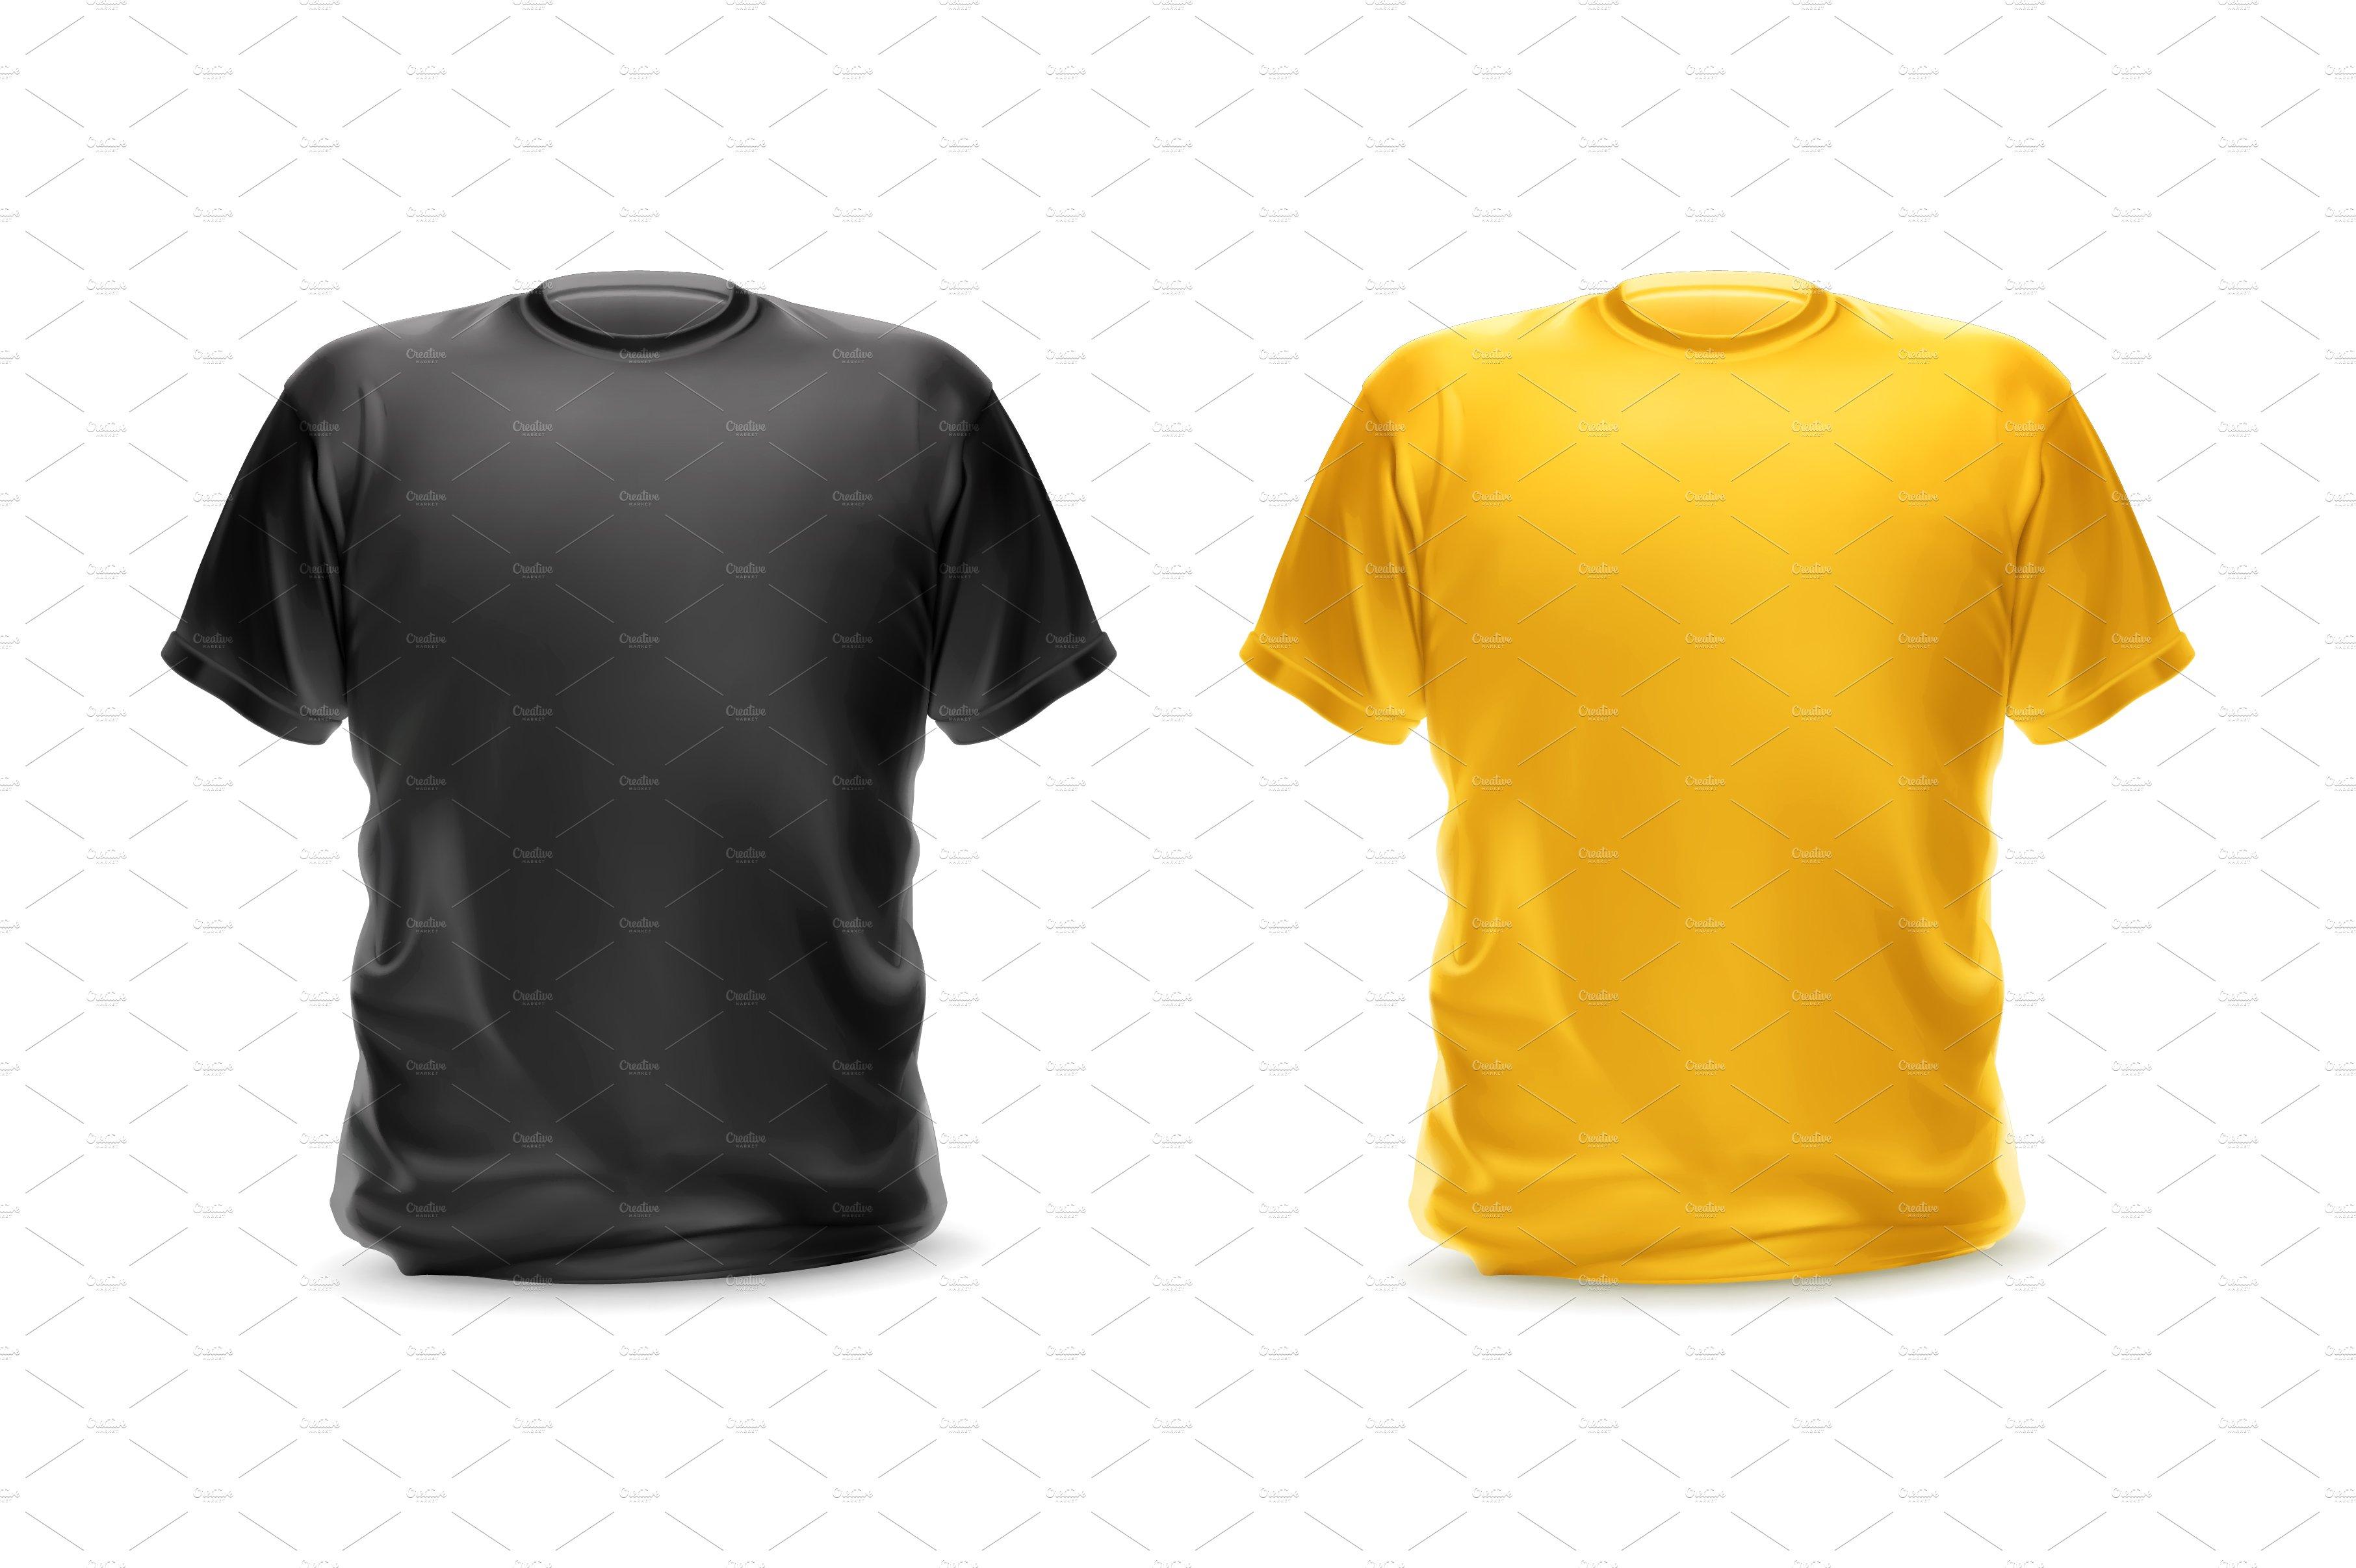 Black t shirt vector - Black And Yellow T Shirts